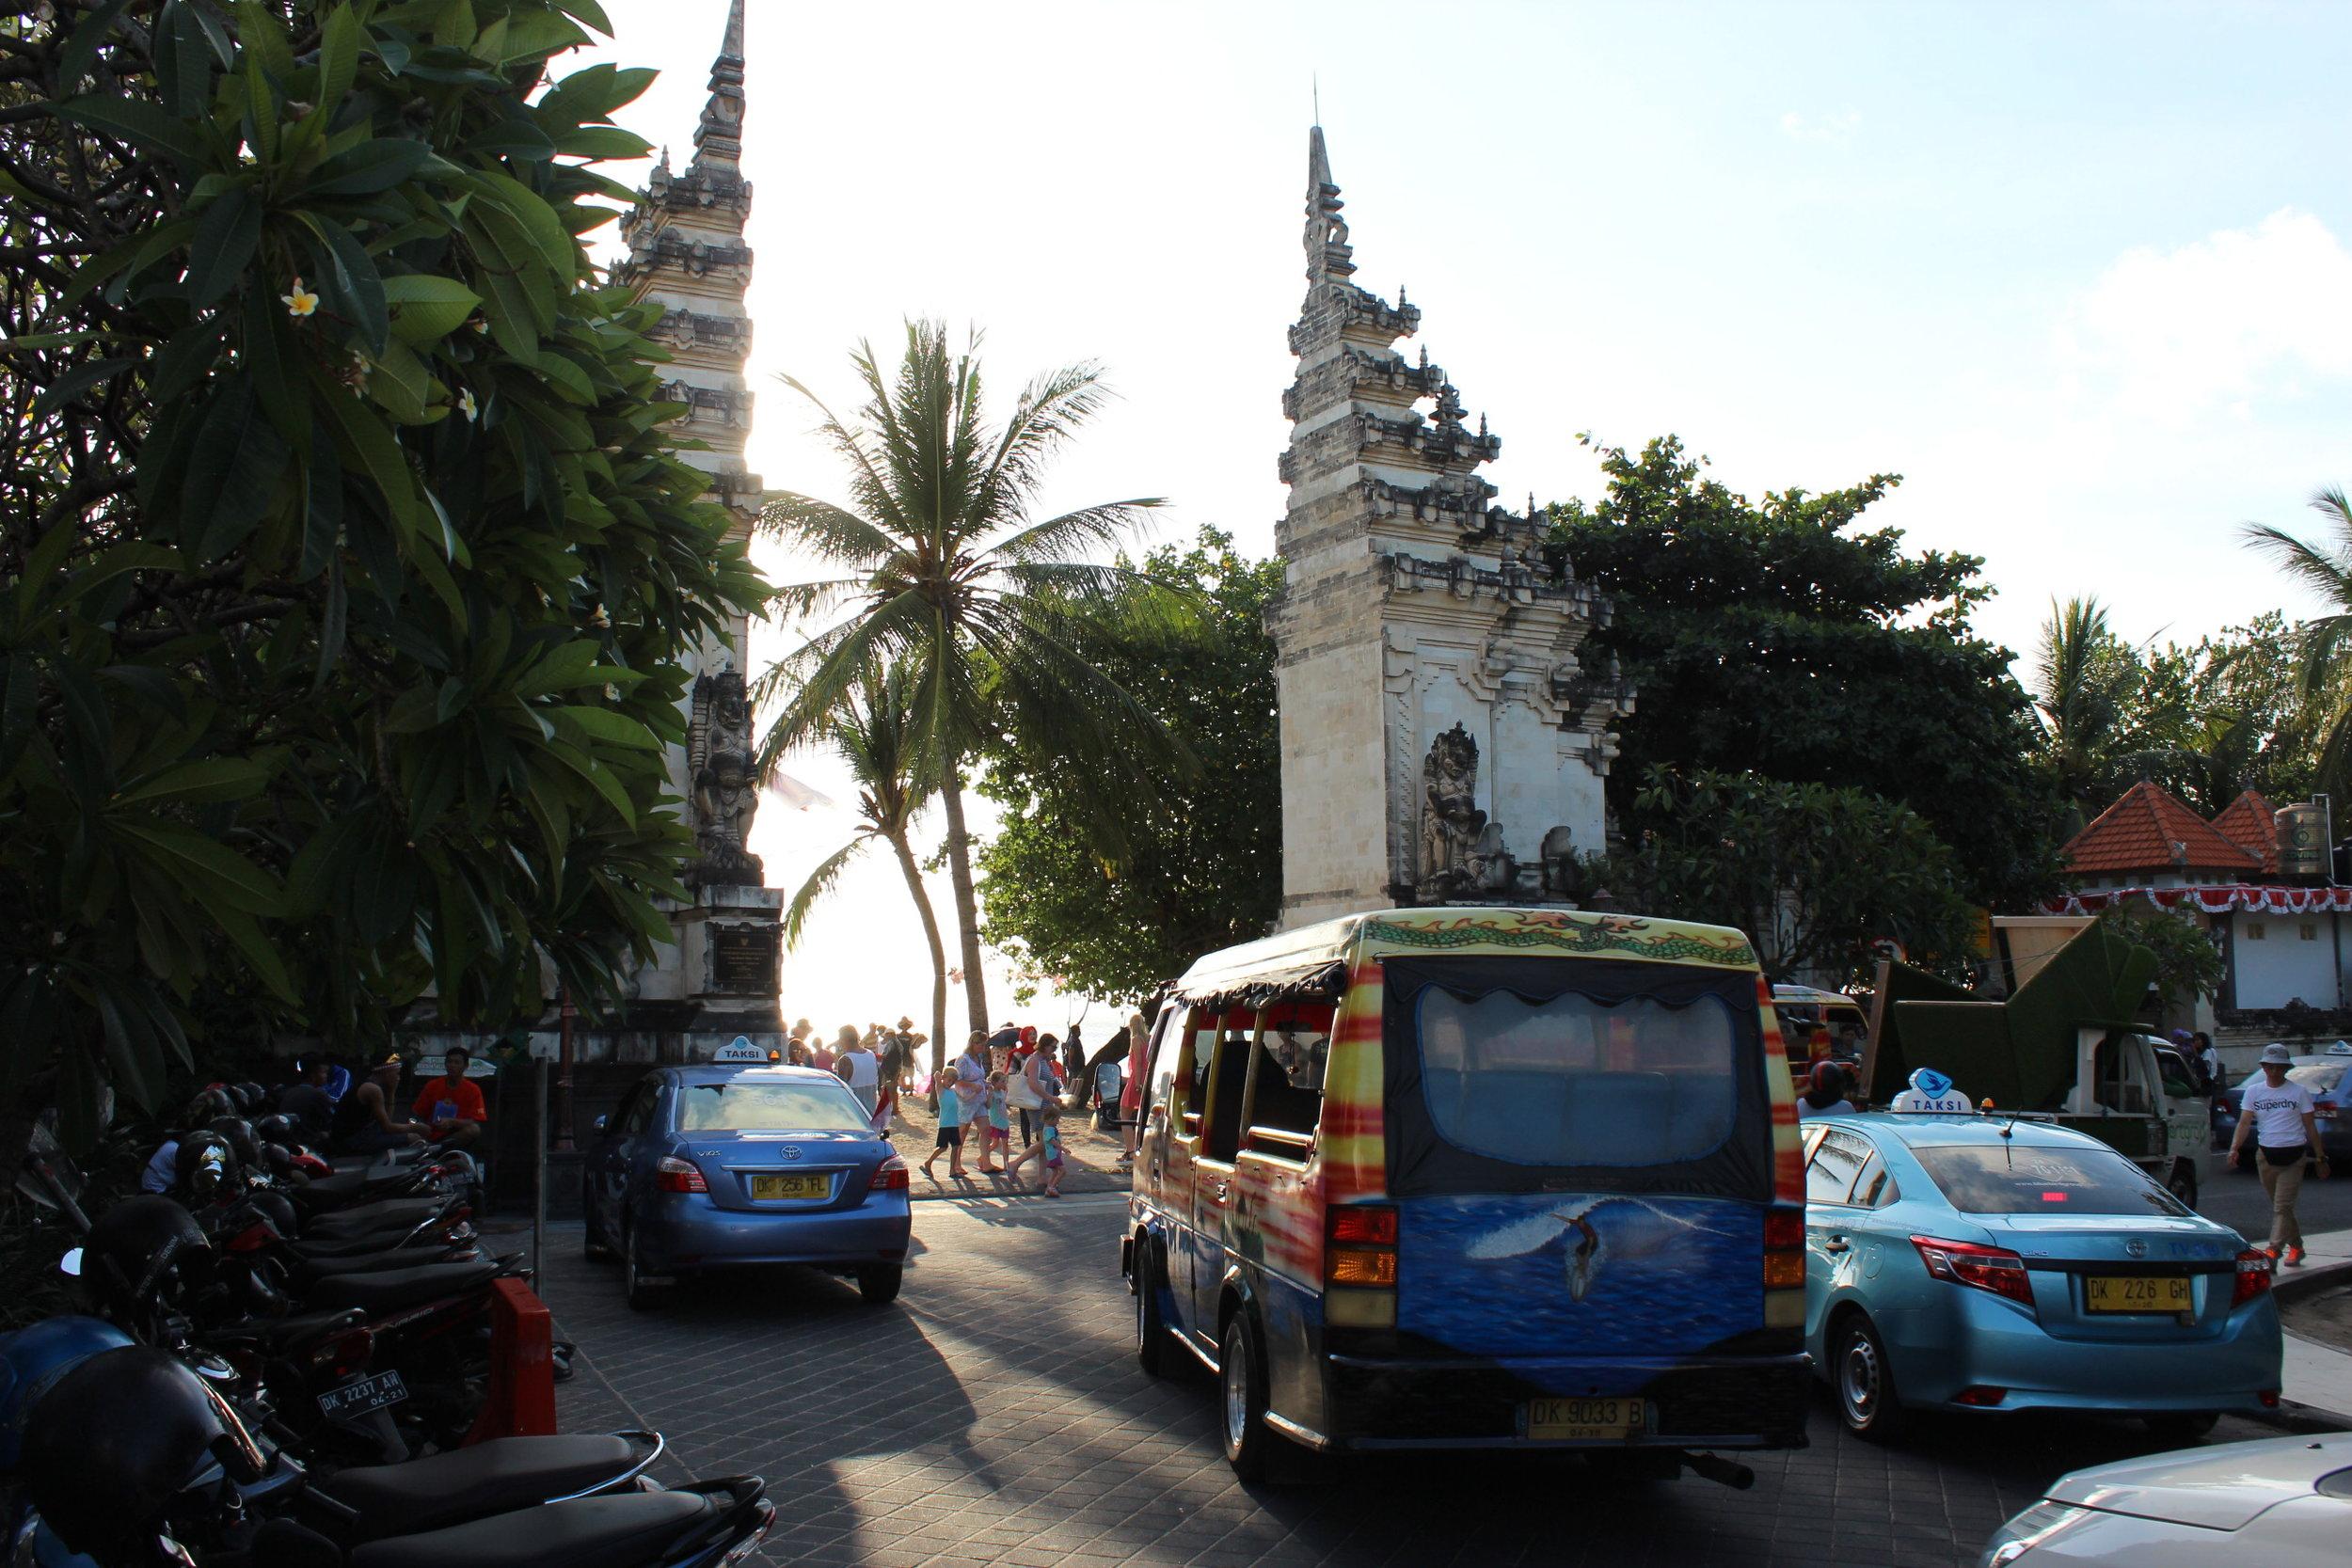 Bali for beginners - transport